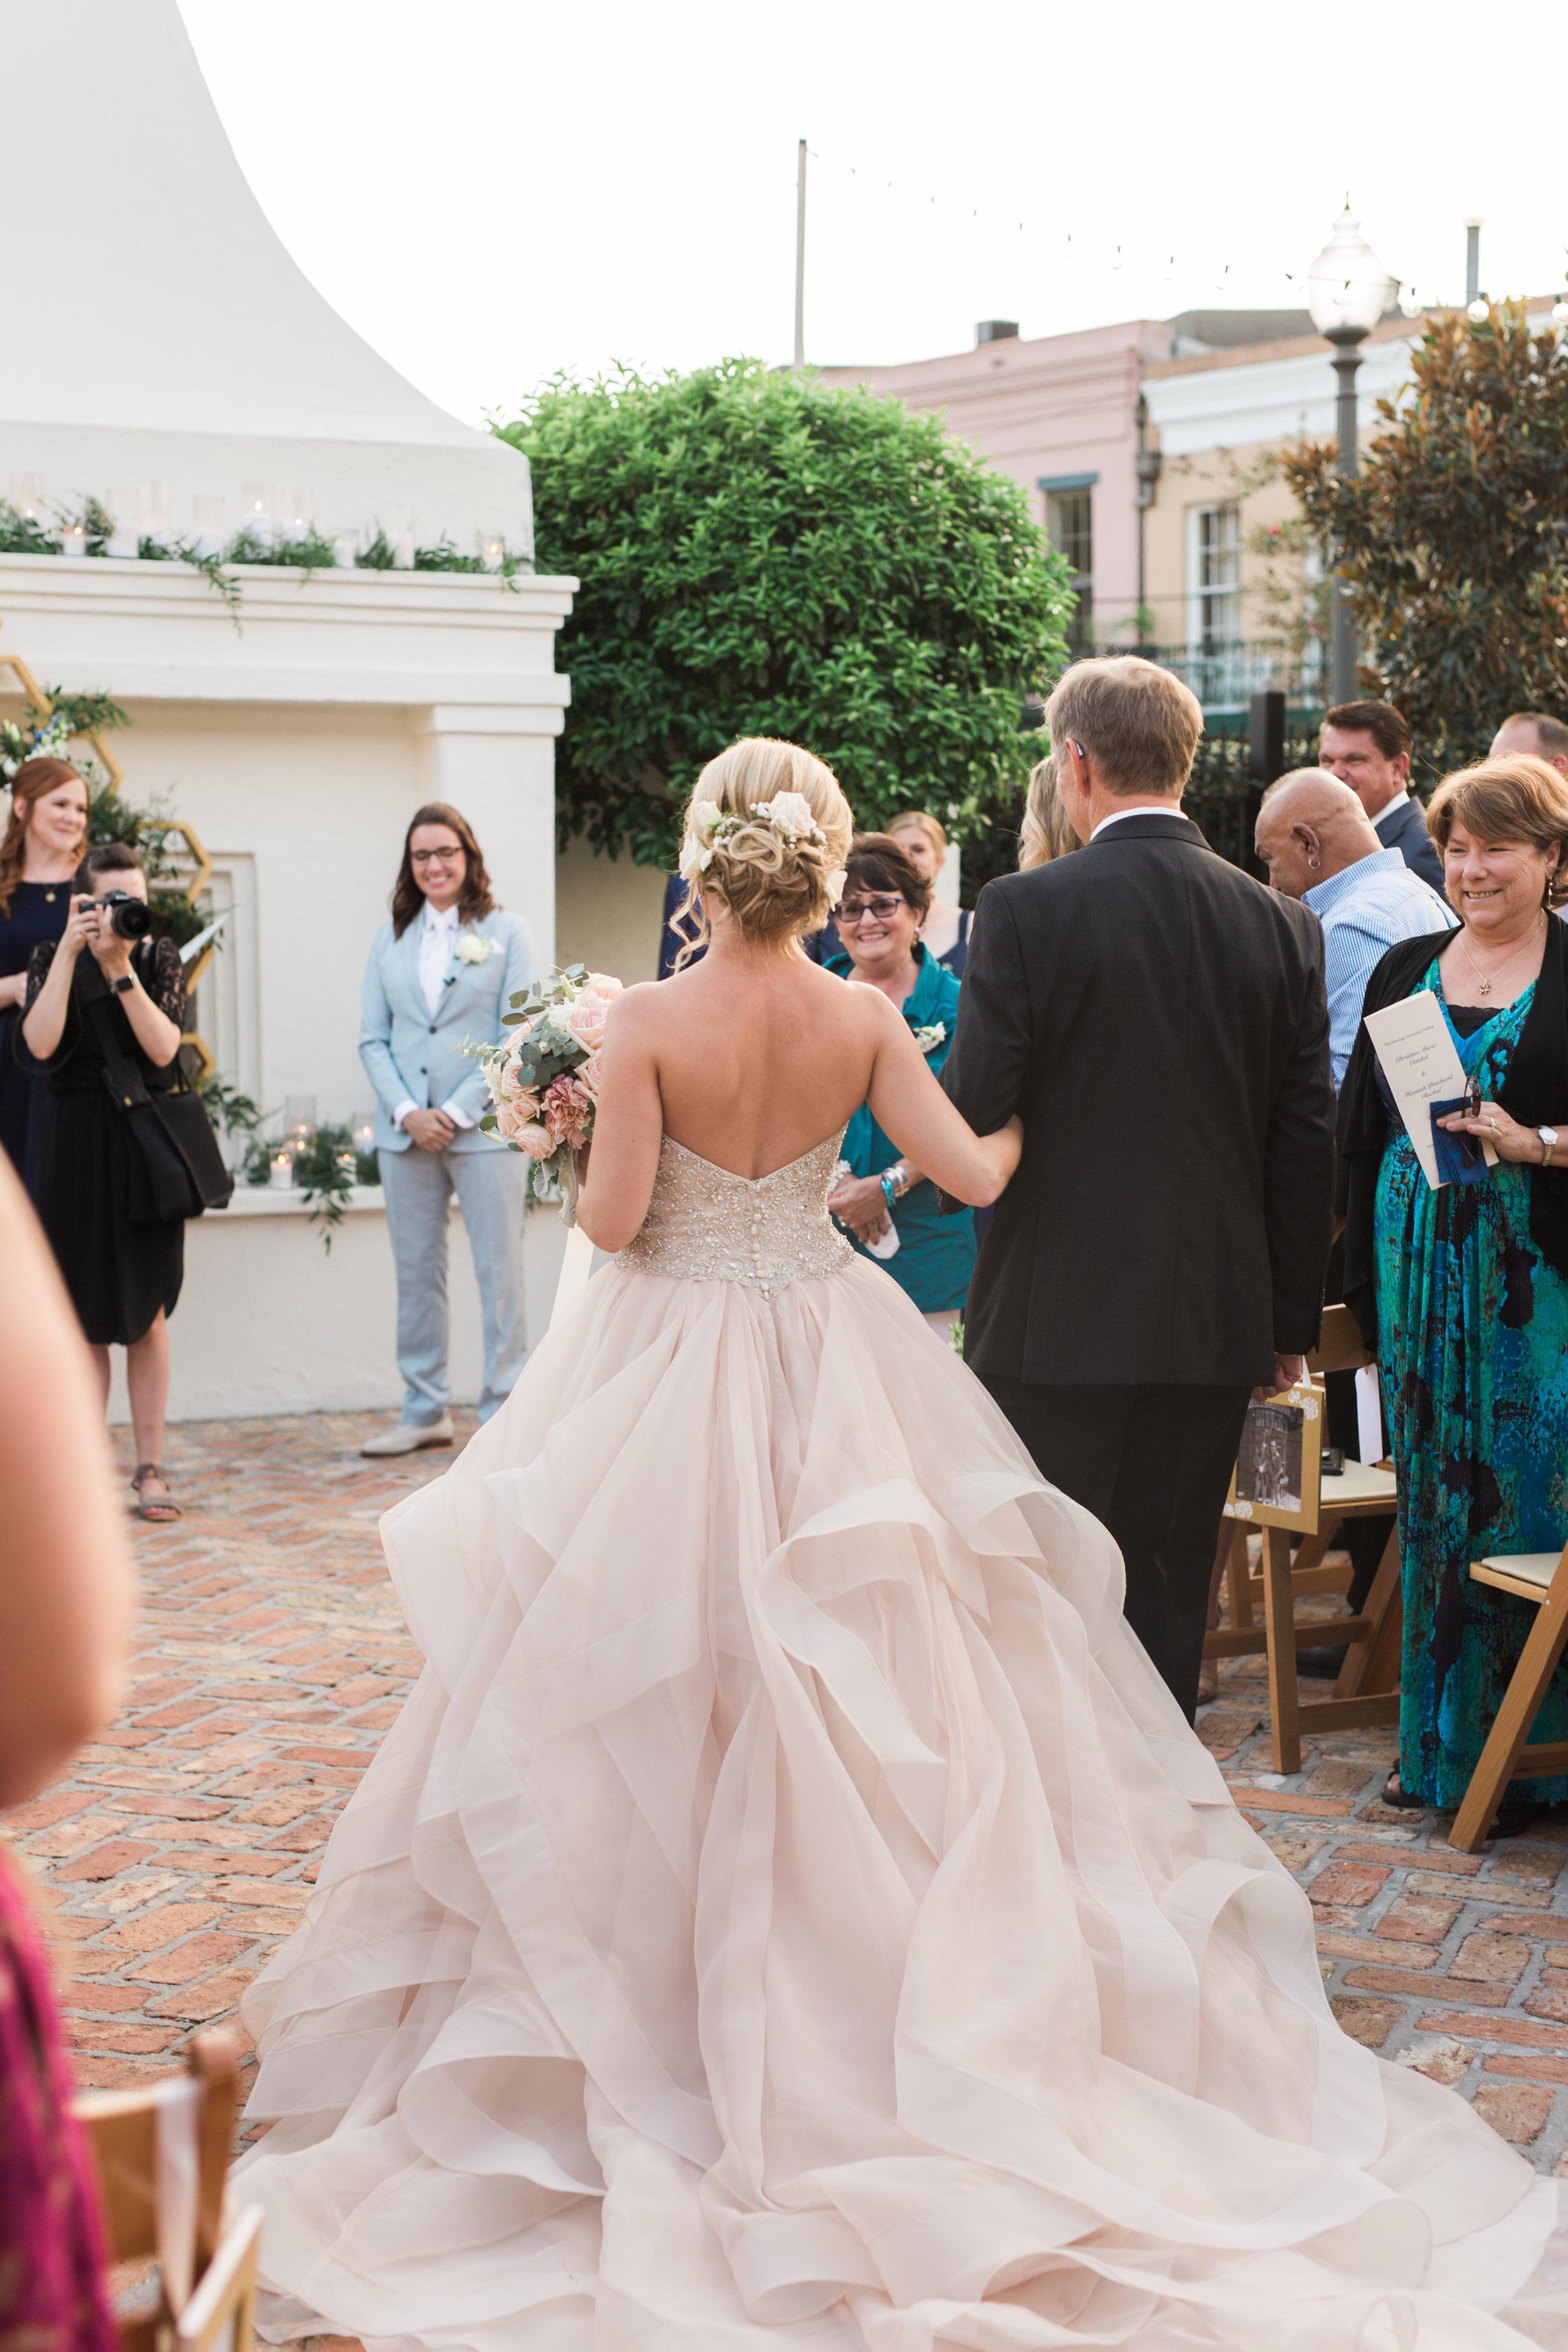 Il Mercato Wedding Planning 167.jpg